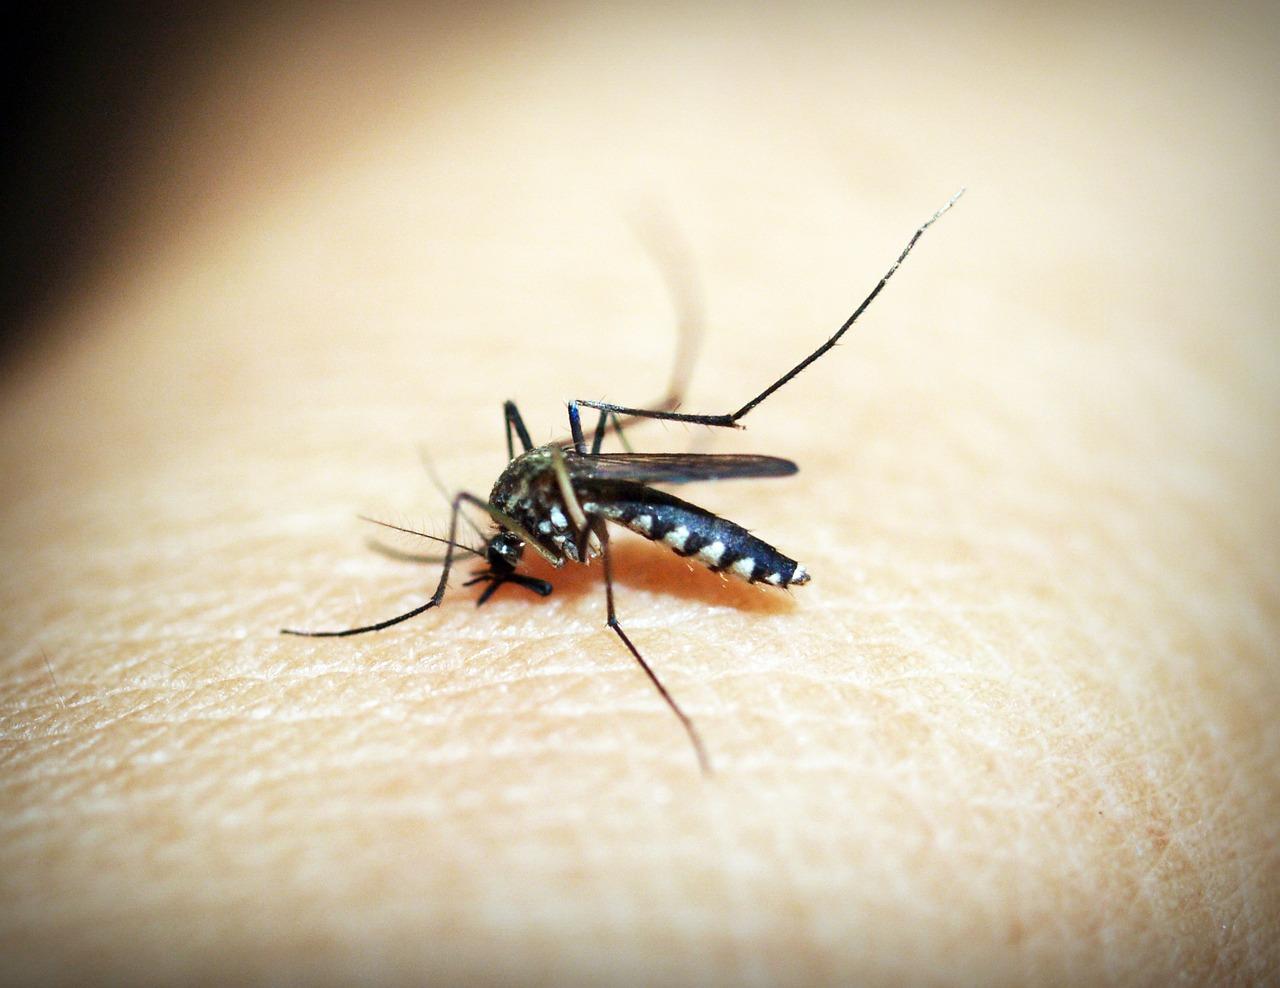 Mosquito Control, Mosquito Treatment, Pest Control, New Orleans Mosquito Exterminator